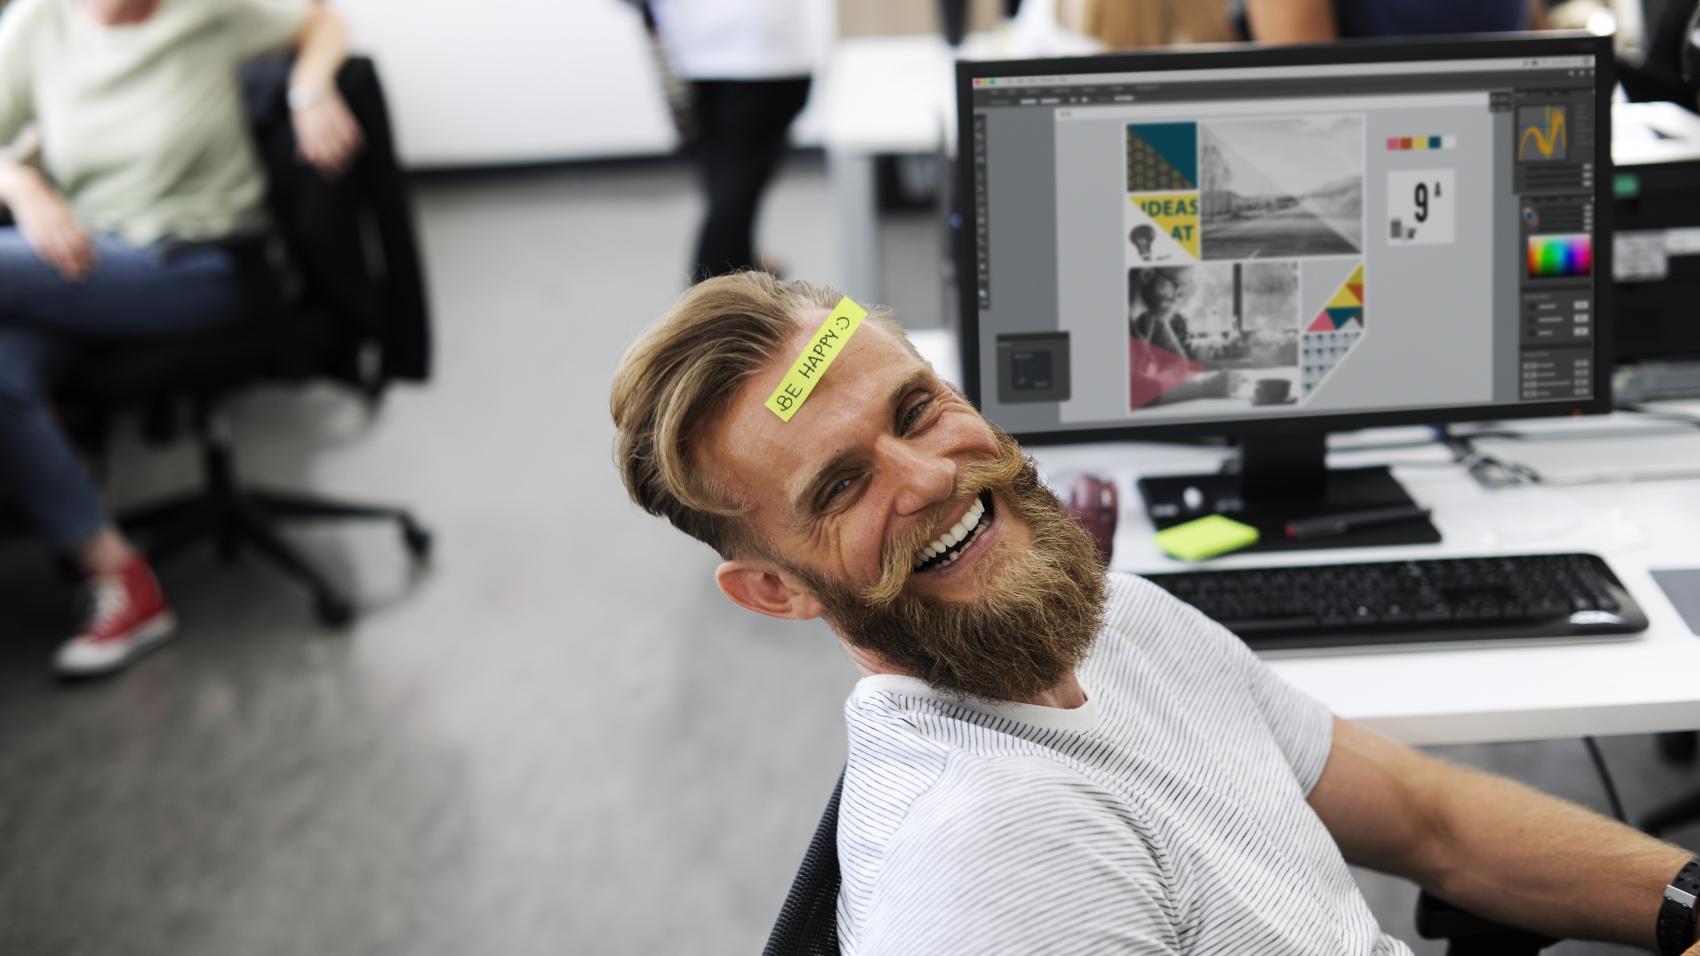 happy worker due to employee appreciation program